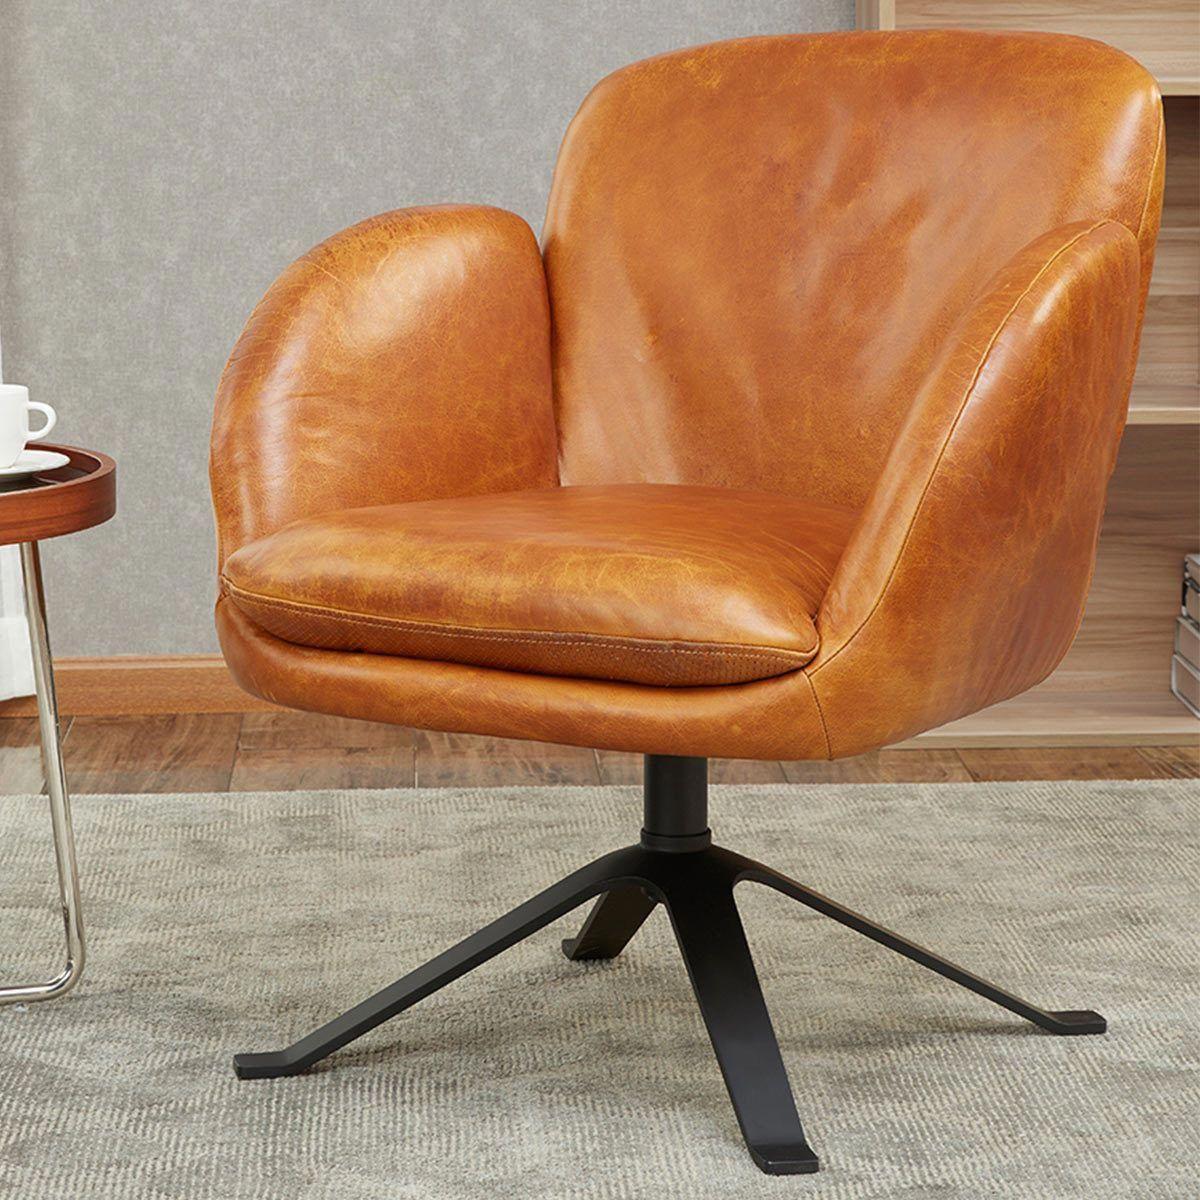 Home Depot Adirondack Chairs SmallFamilyRoomChairs